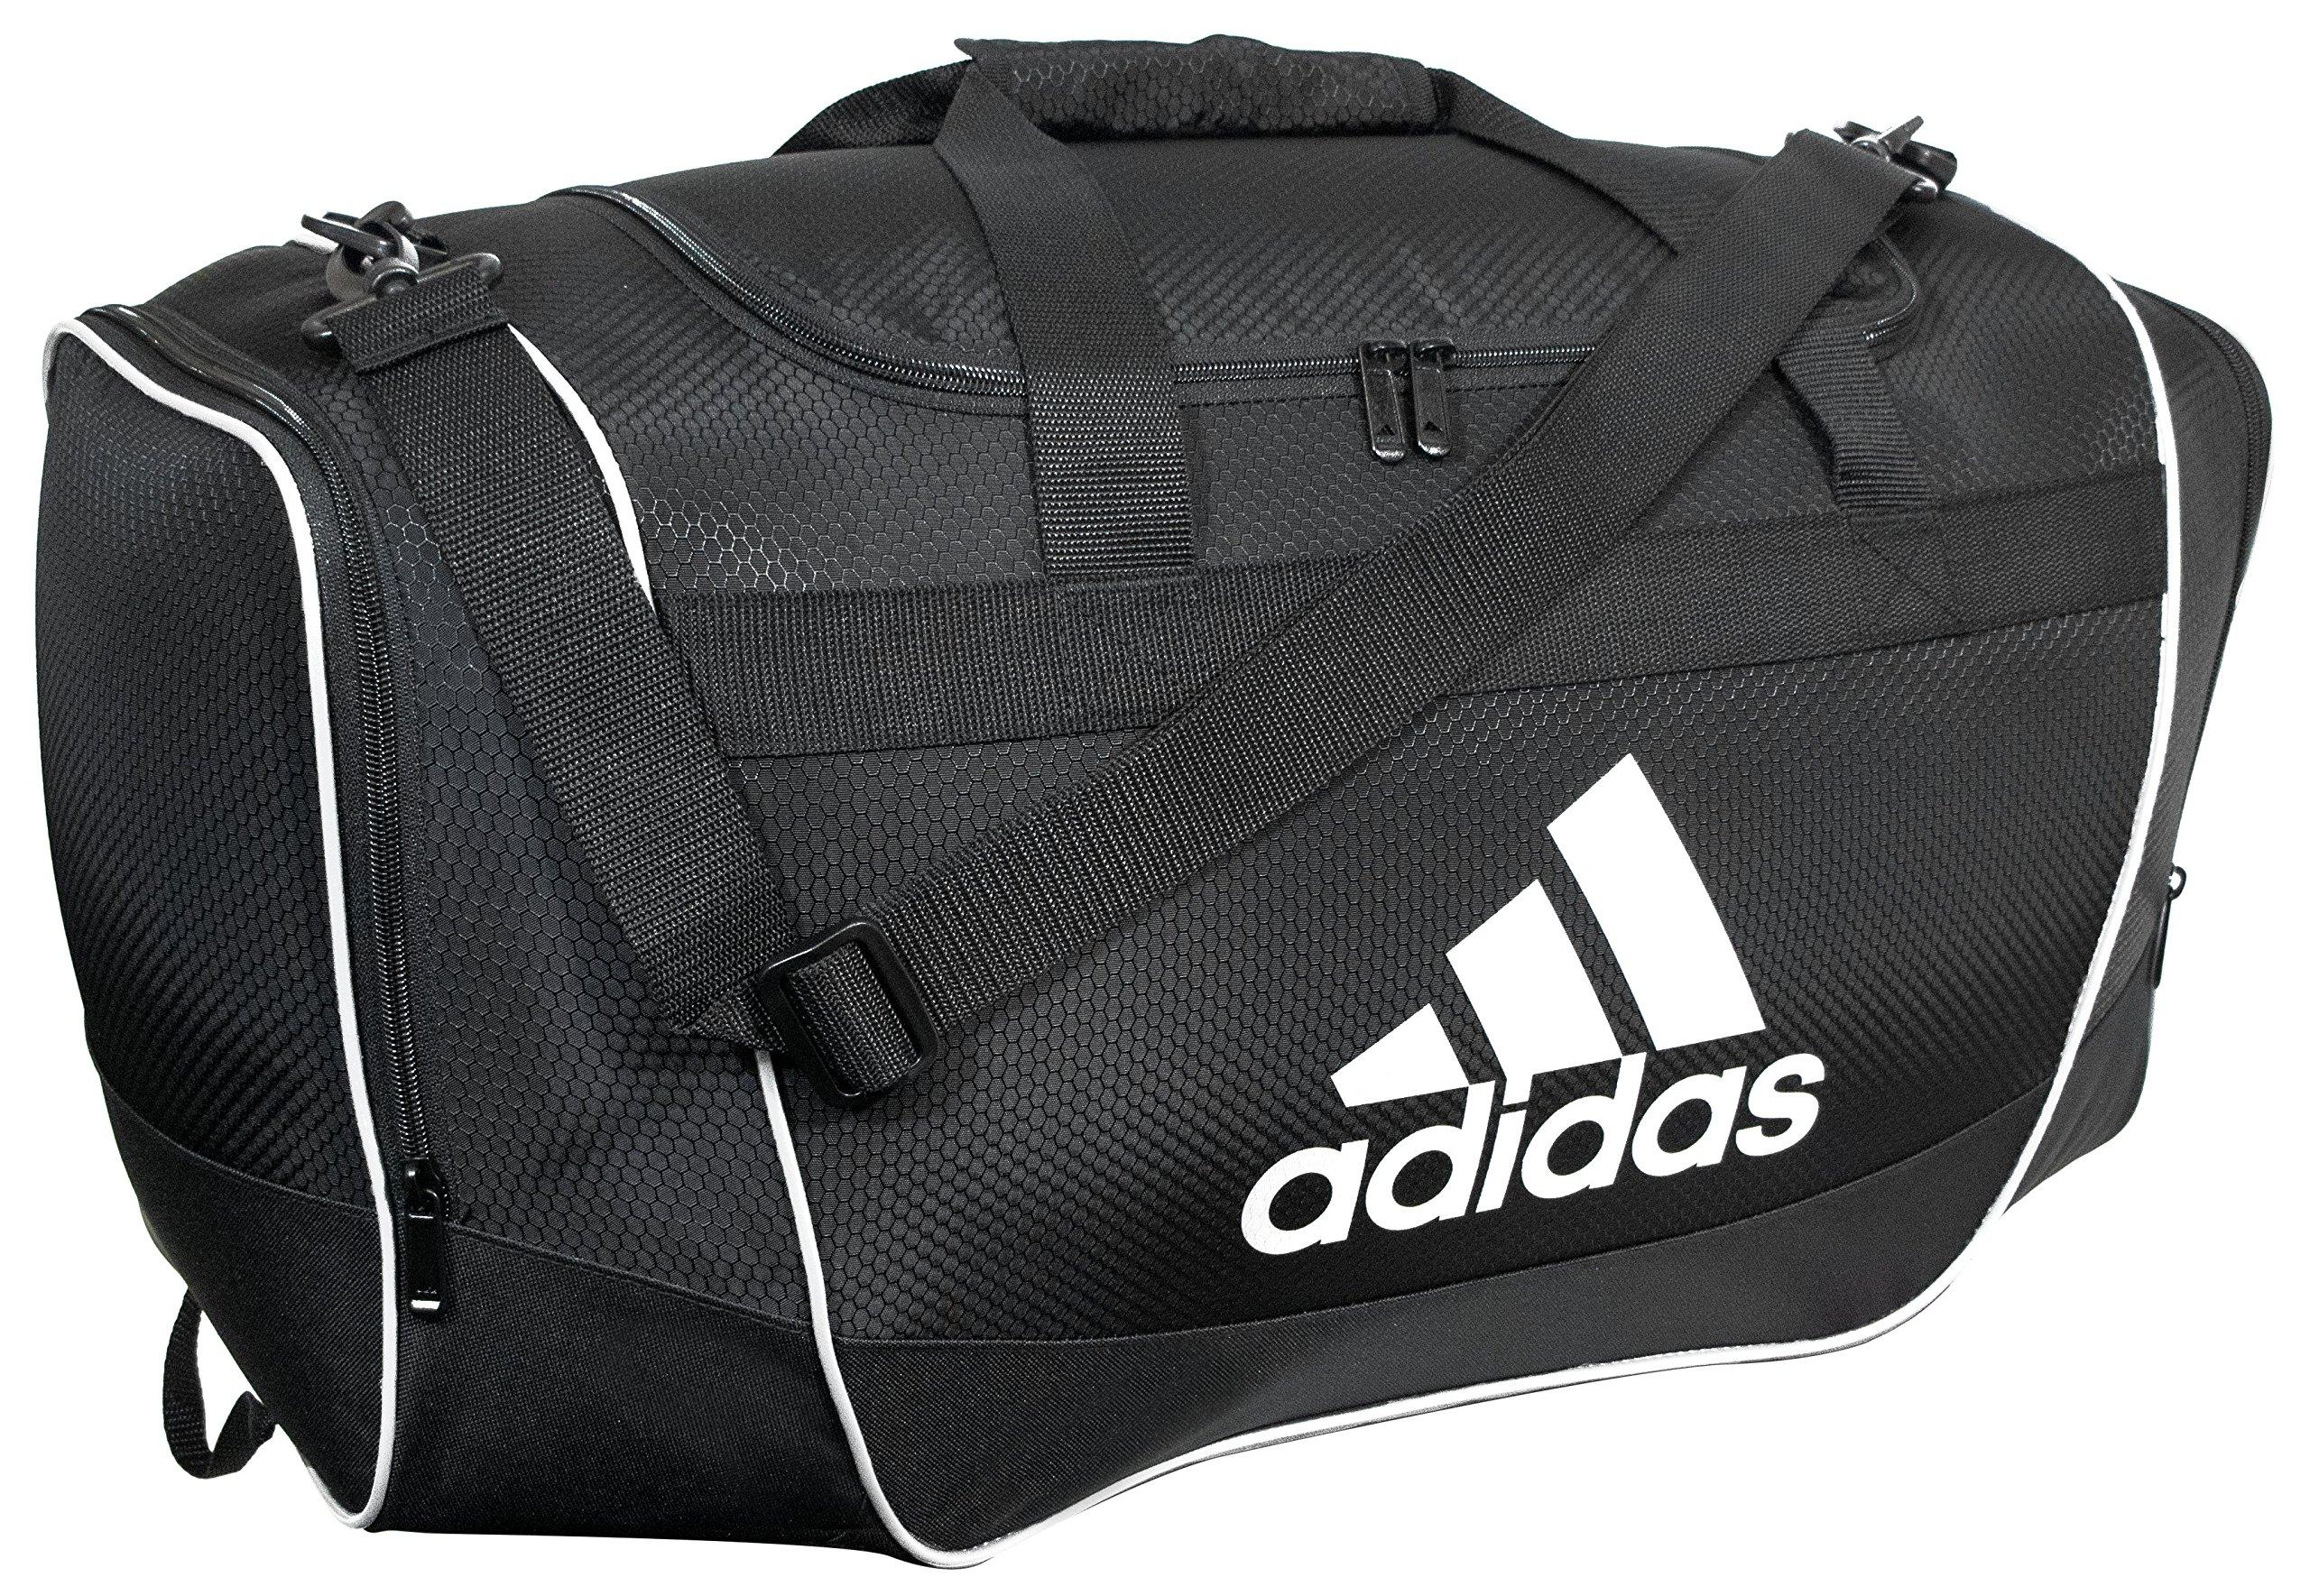 adidas Defender II Duffel Bag, Black, Small